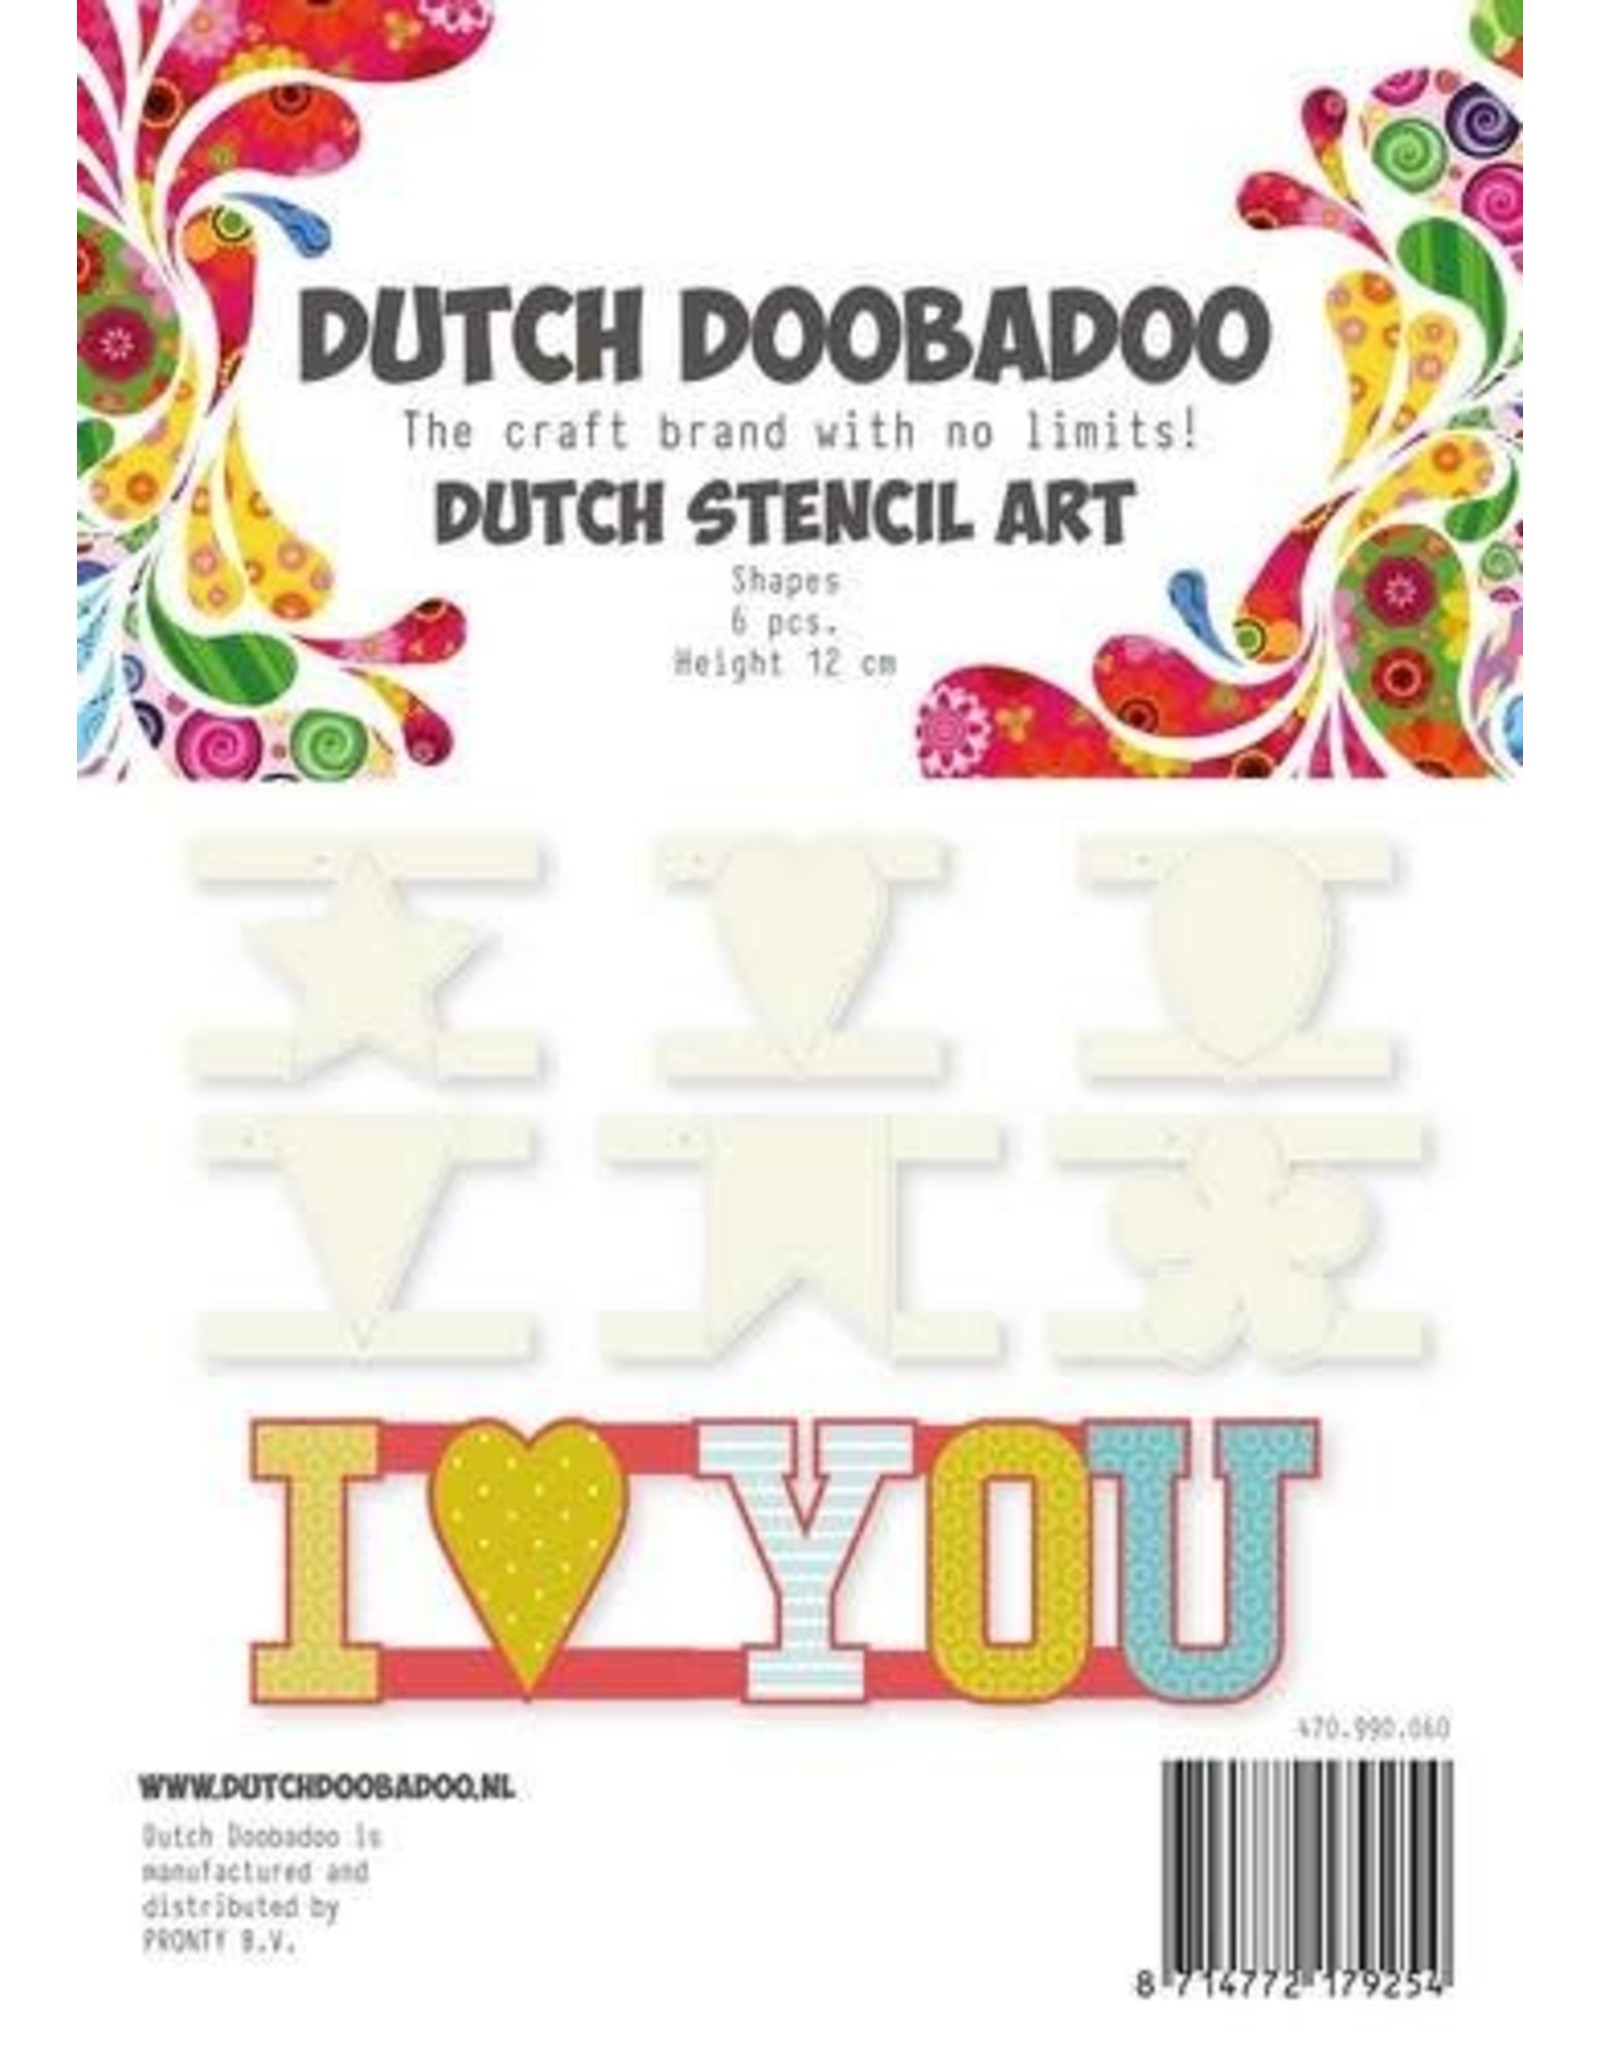 Dutch Doobadoo Stencil Dutch Doobadoo Dutch Stencil Art Shapes 470.990.060